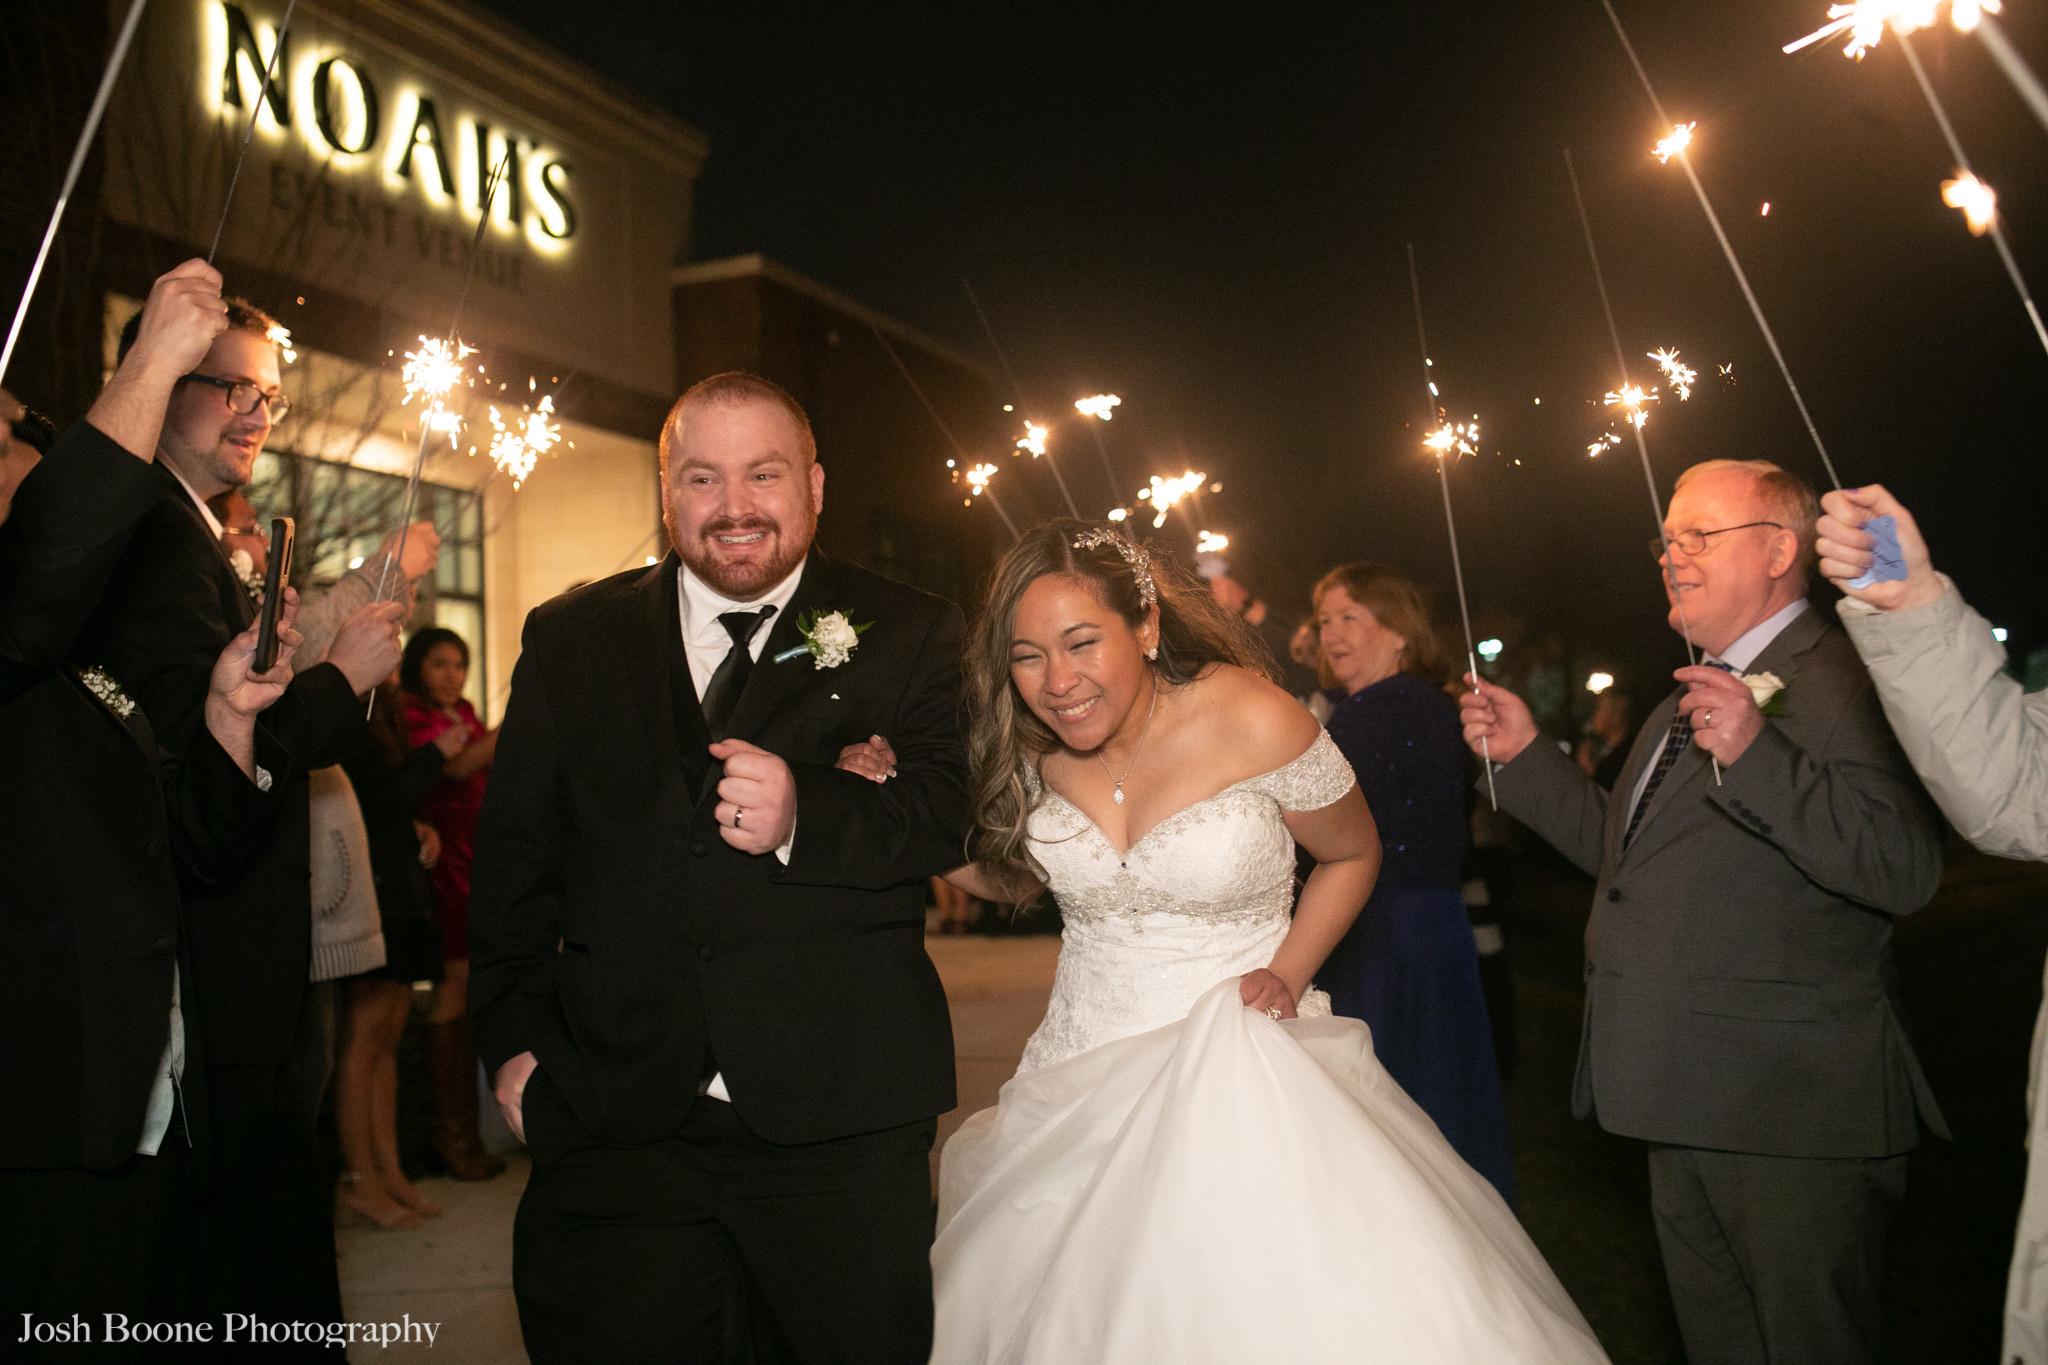 noahs_event_venue_wedding-109.jpg